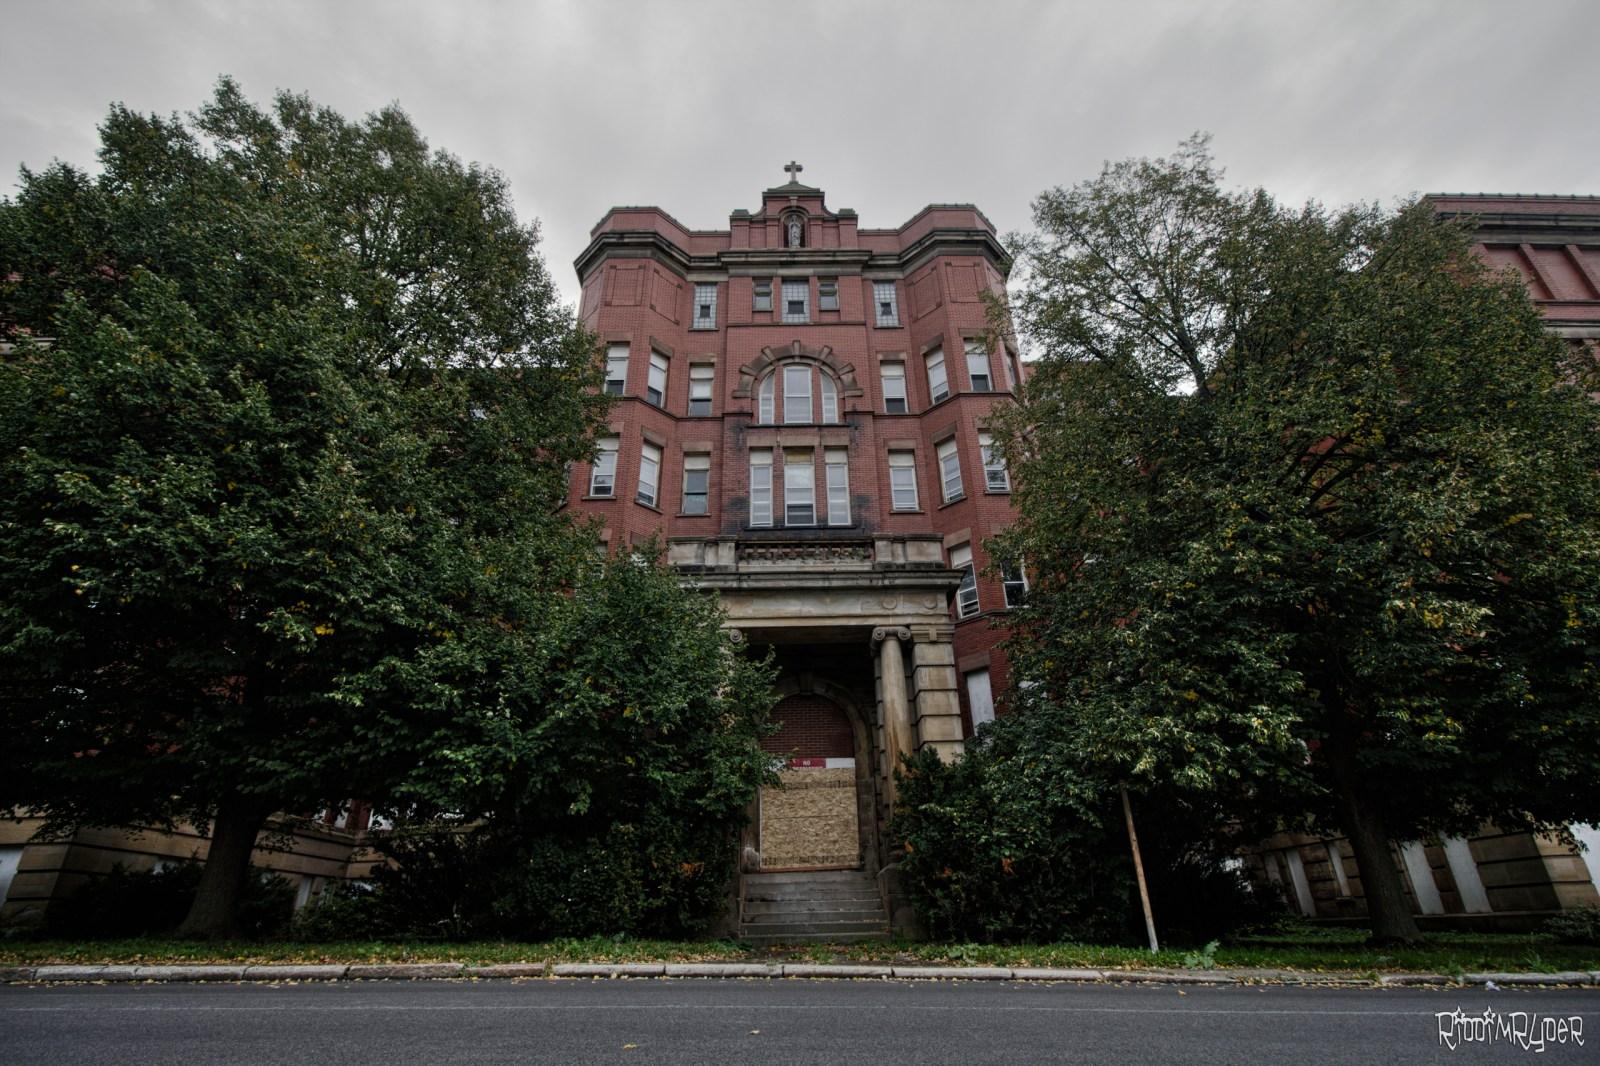 Abandoned St, Mary's Hospital